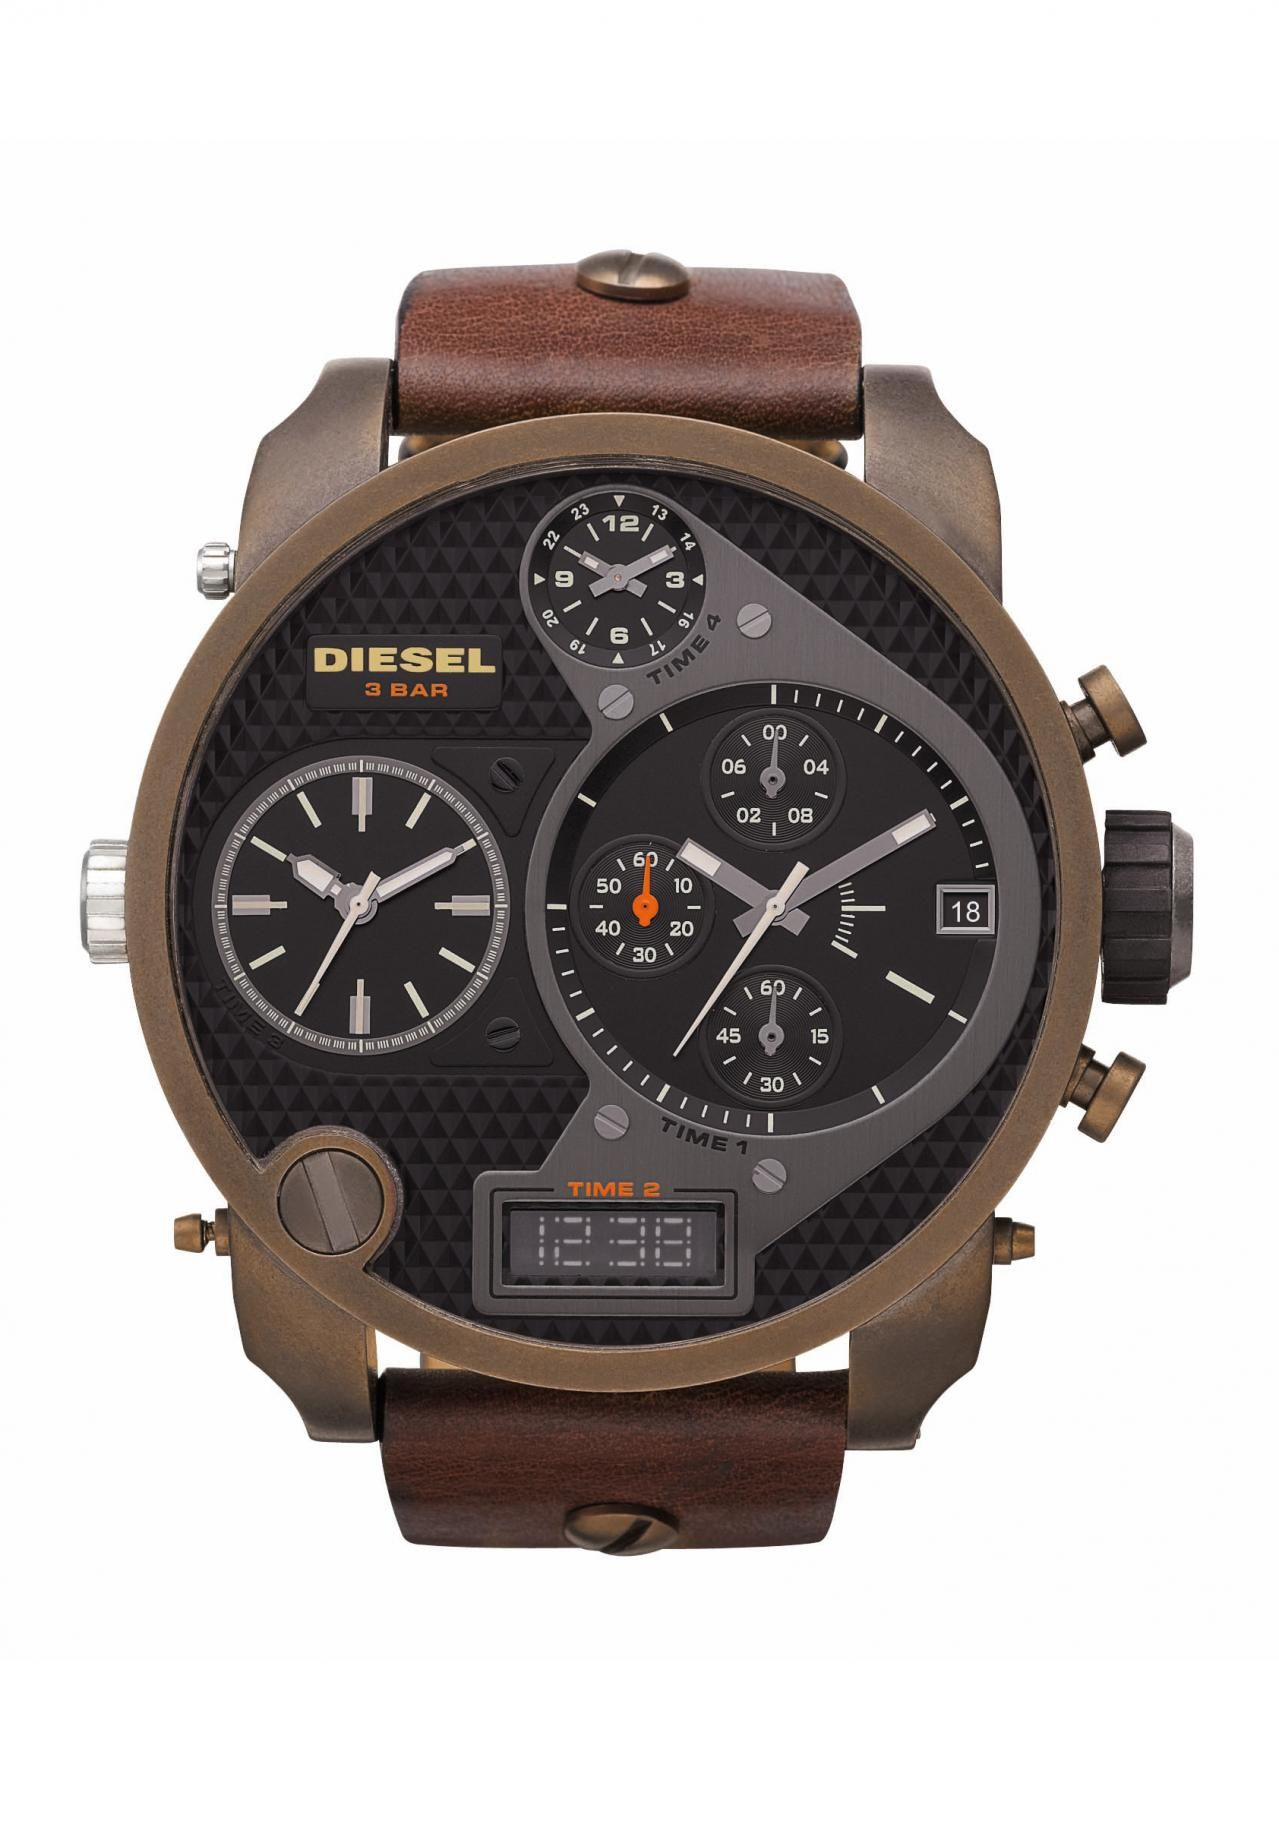 d89d35a3e50 Diesel XL Oversize Men´s Chronograph DZ7246 nur € 299.00. Relógios  MasculinosPensamentosRelógio ...